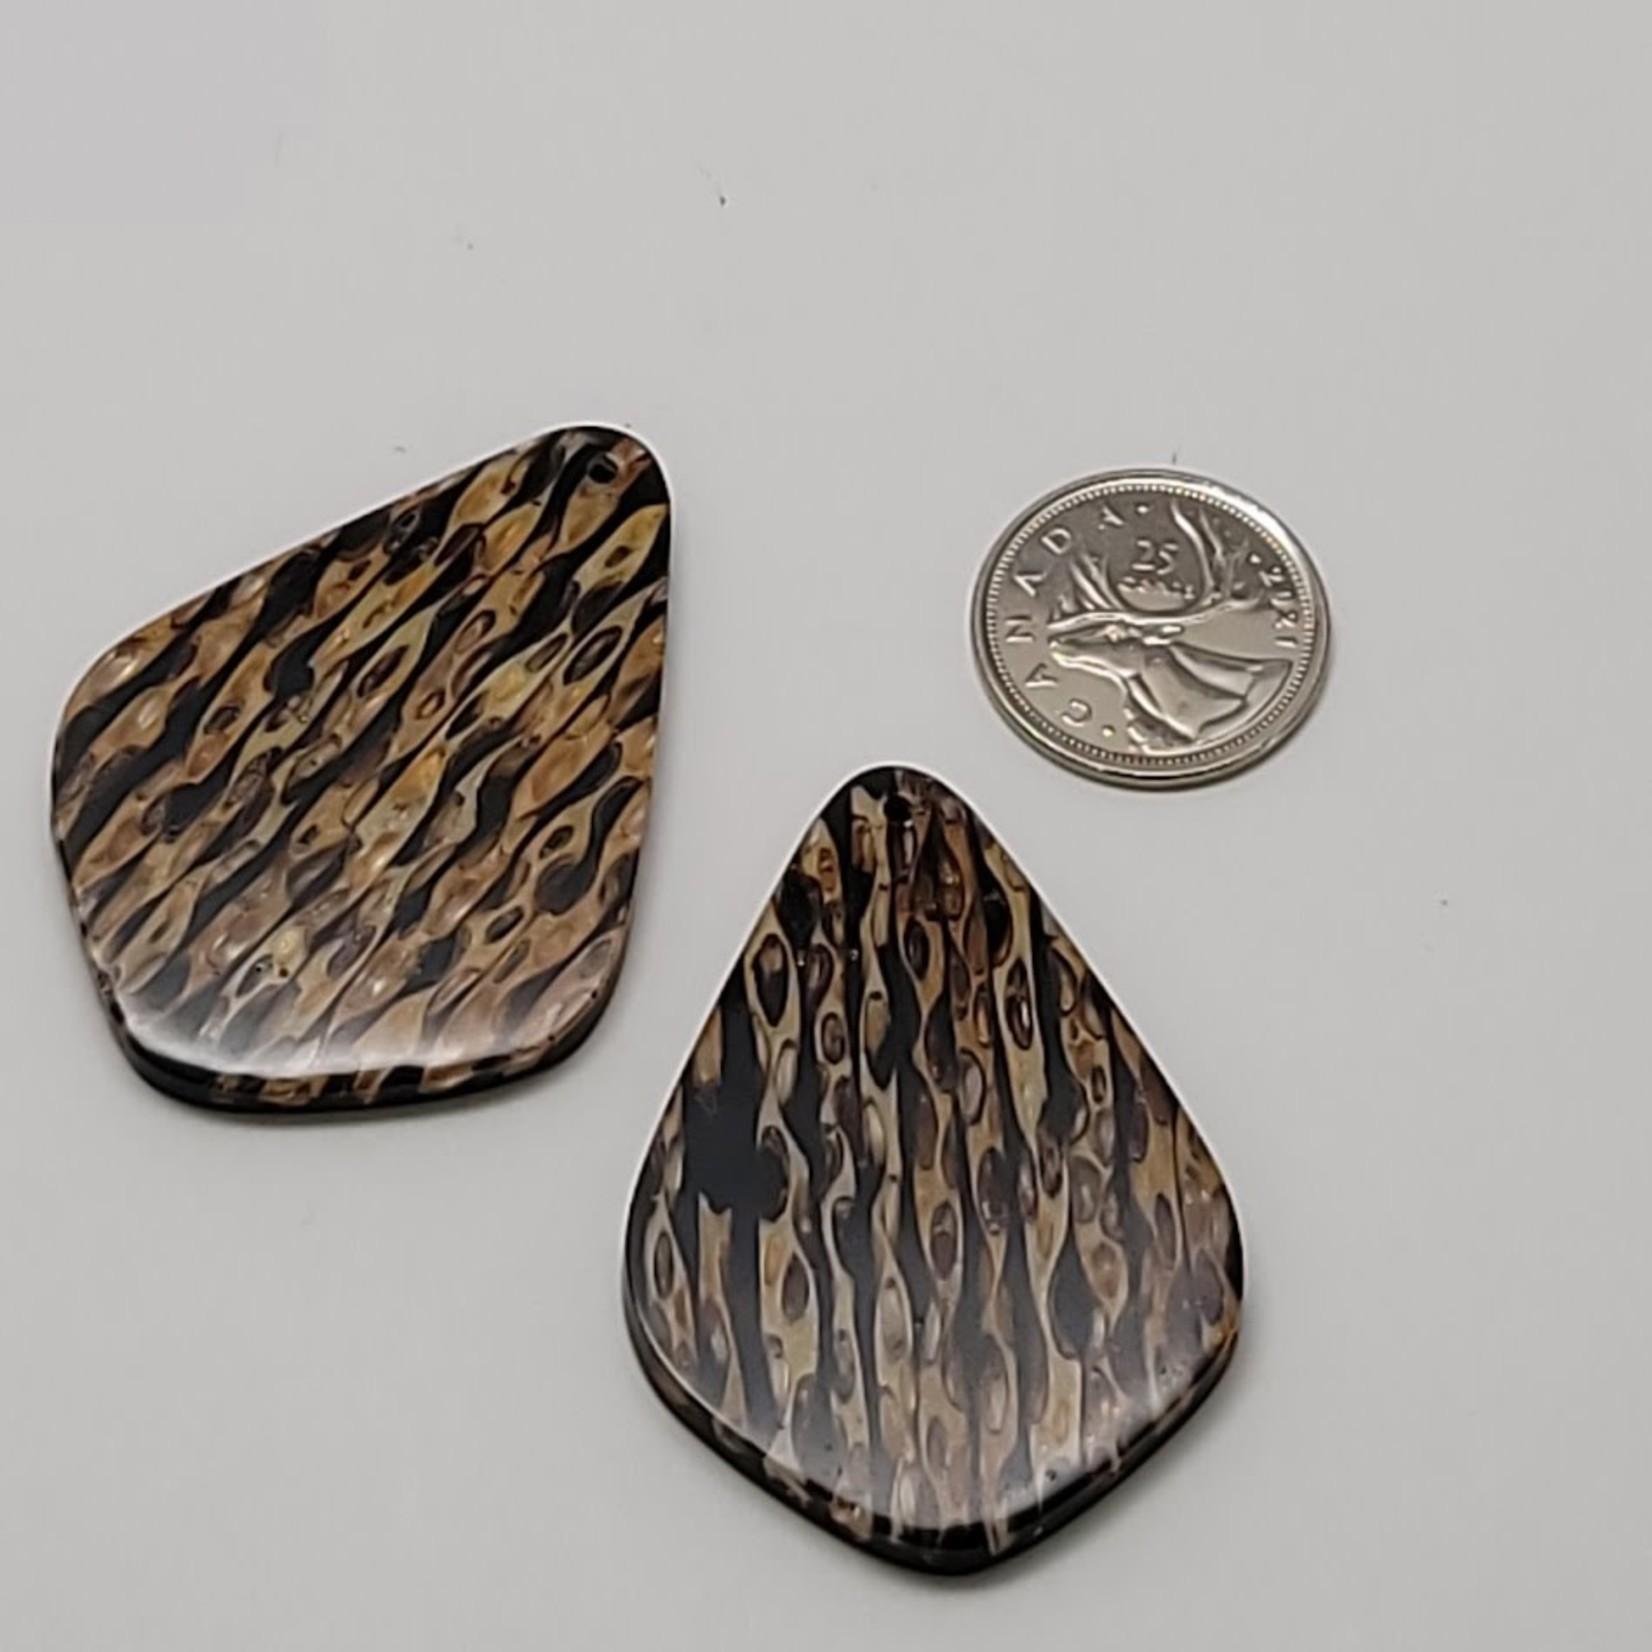 Elongated Diamond with Stripes